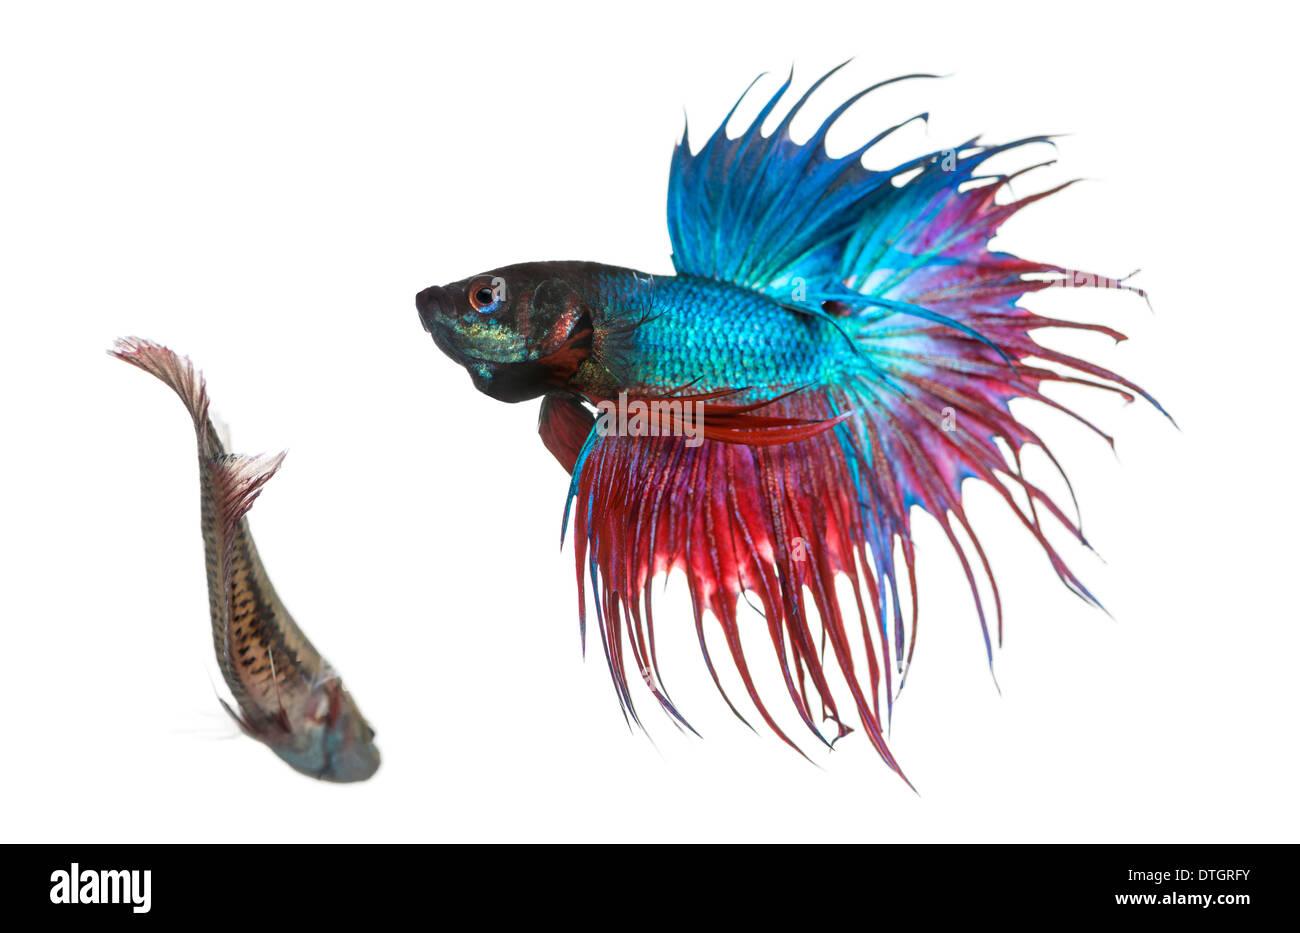 Male and female siamese fighting fish in a courtship dance for Betta fish behavior